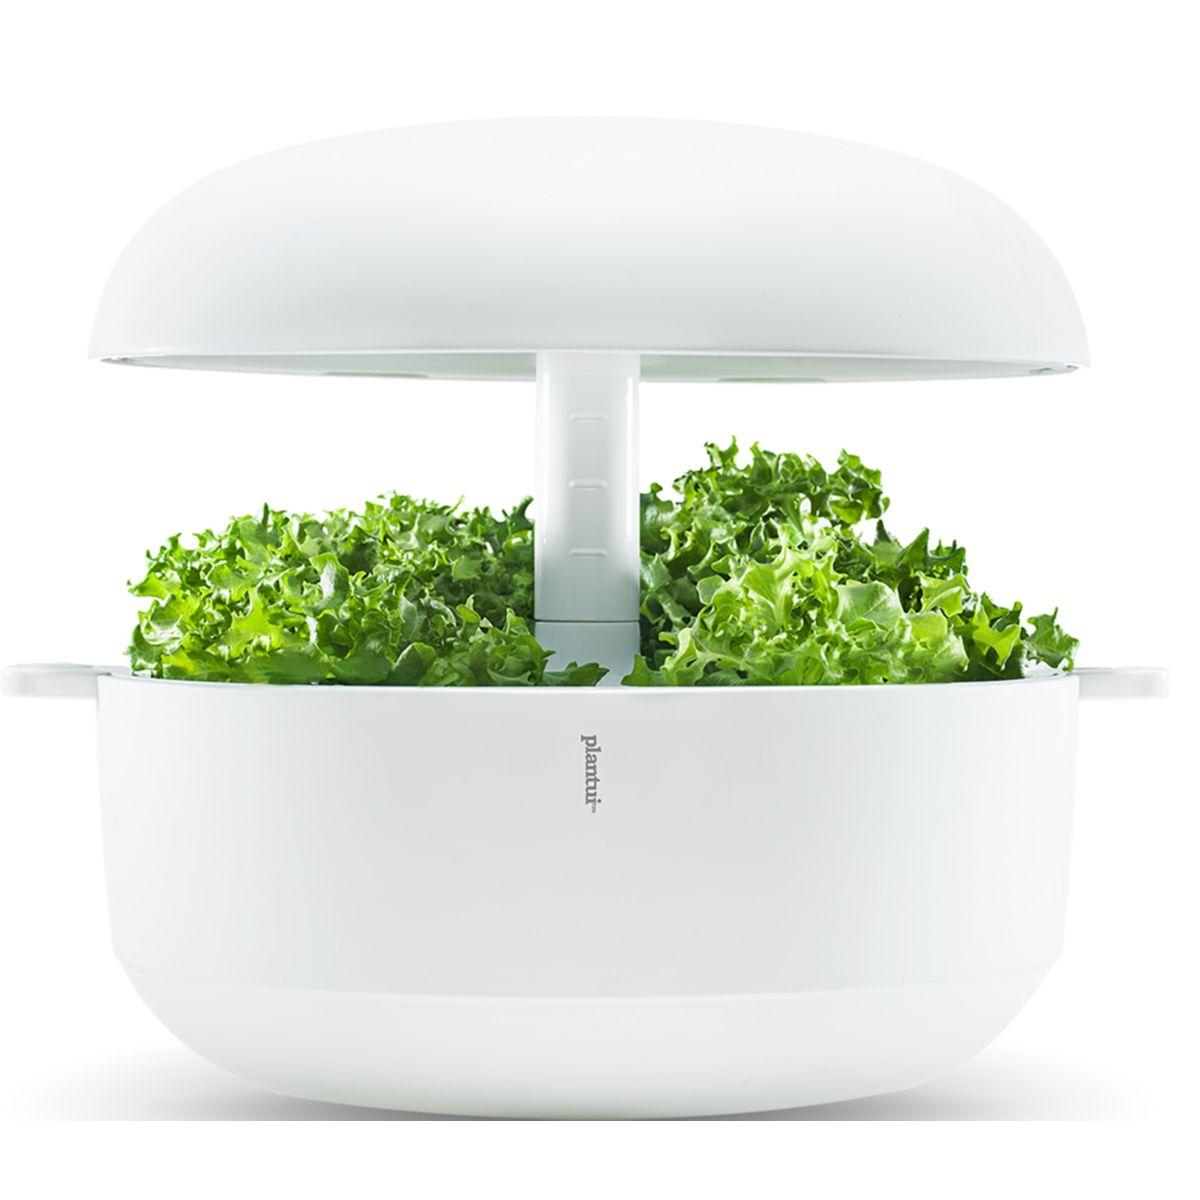 Jardin d'intérieur PLANTUI 6 Smart Garden Blanc